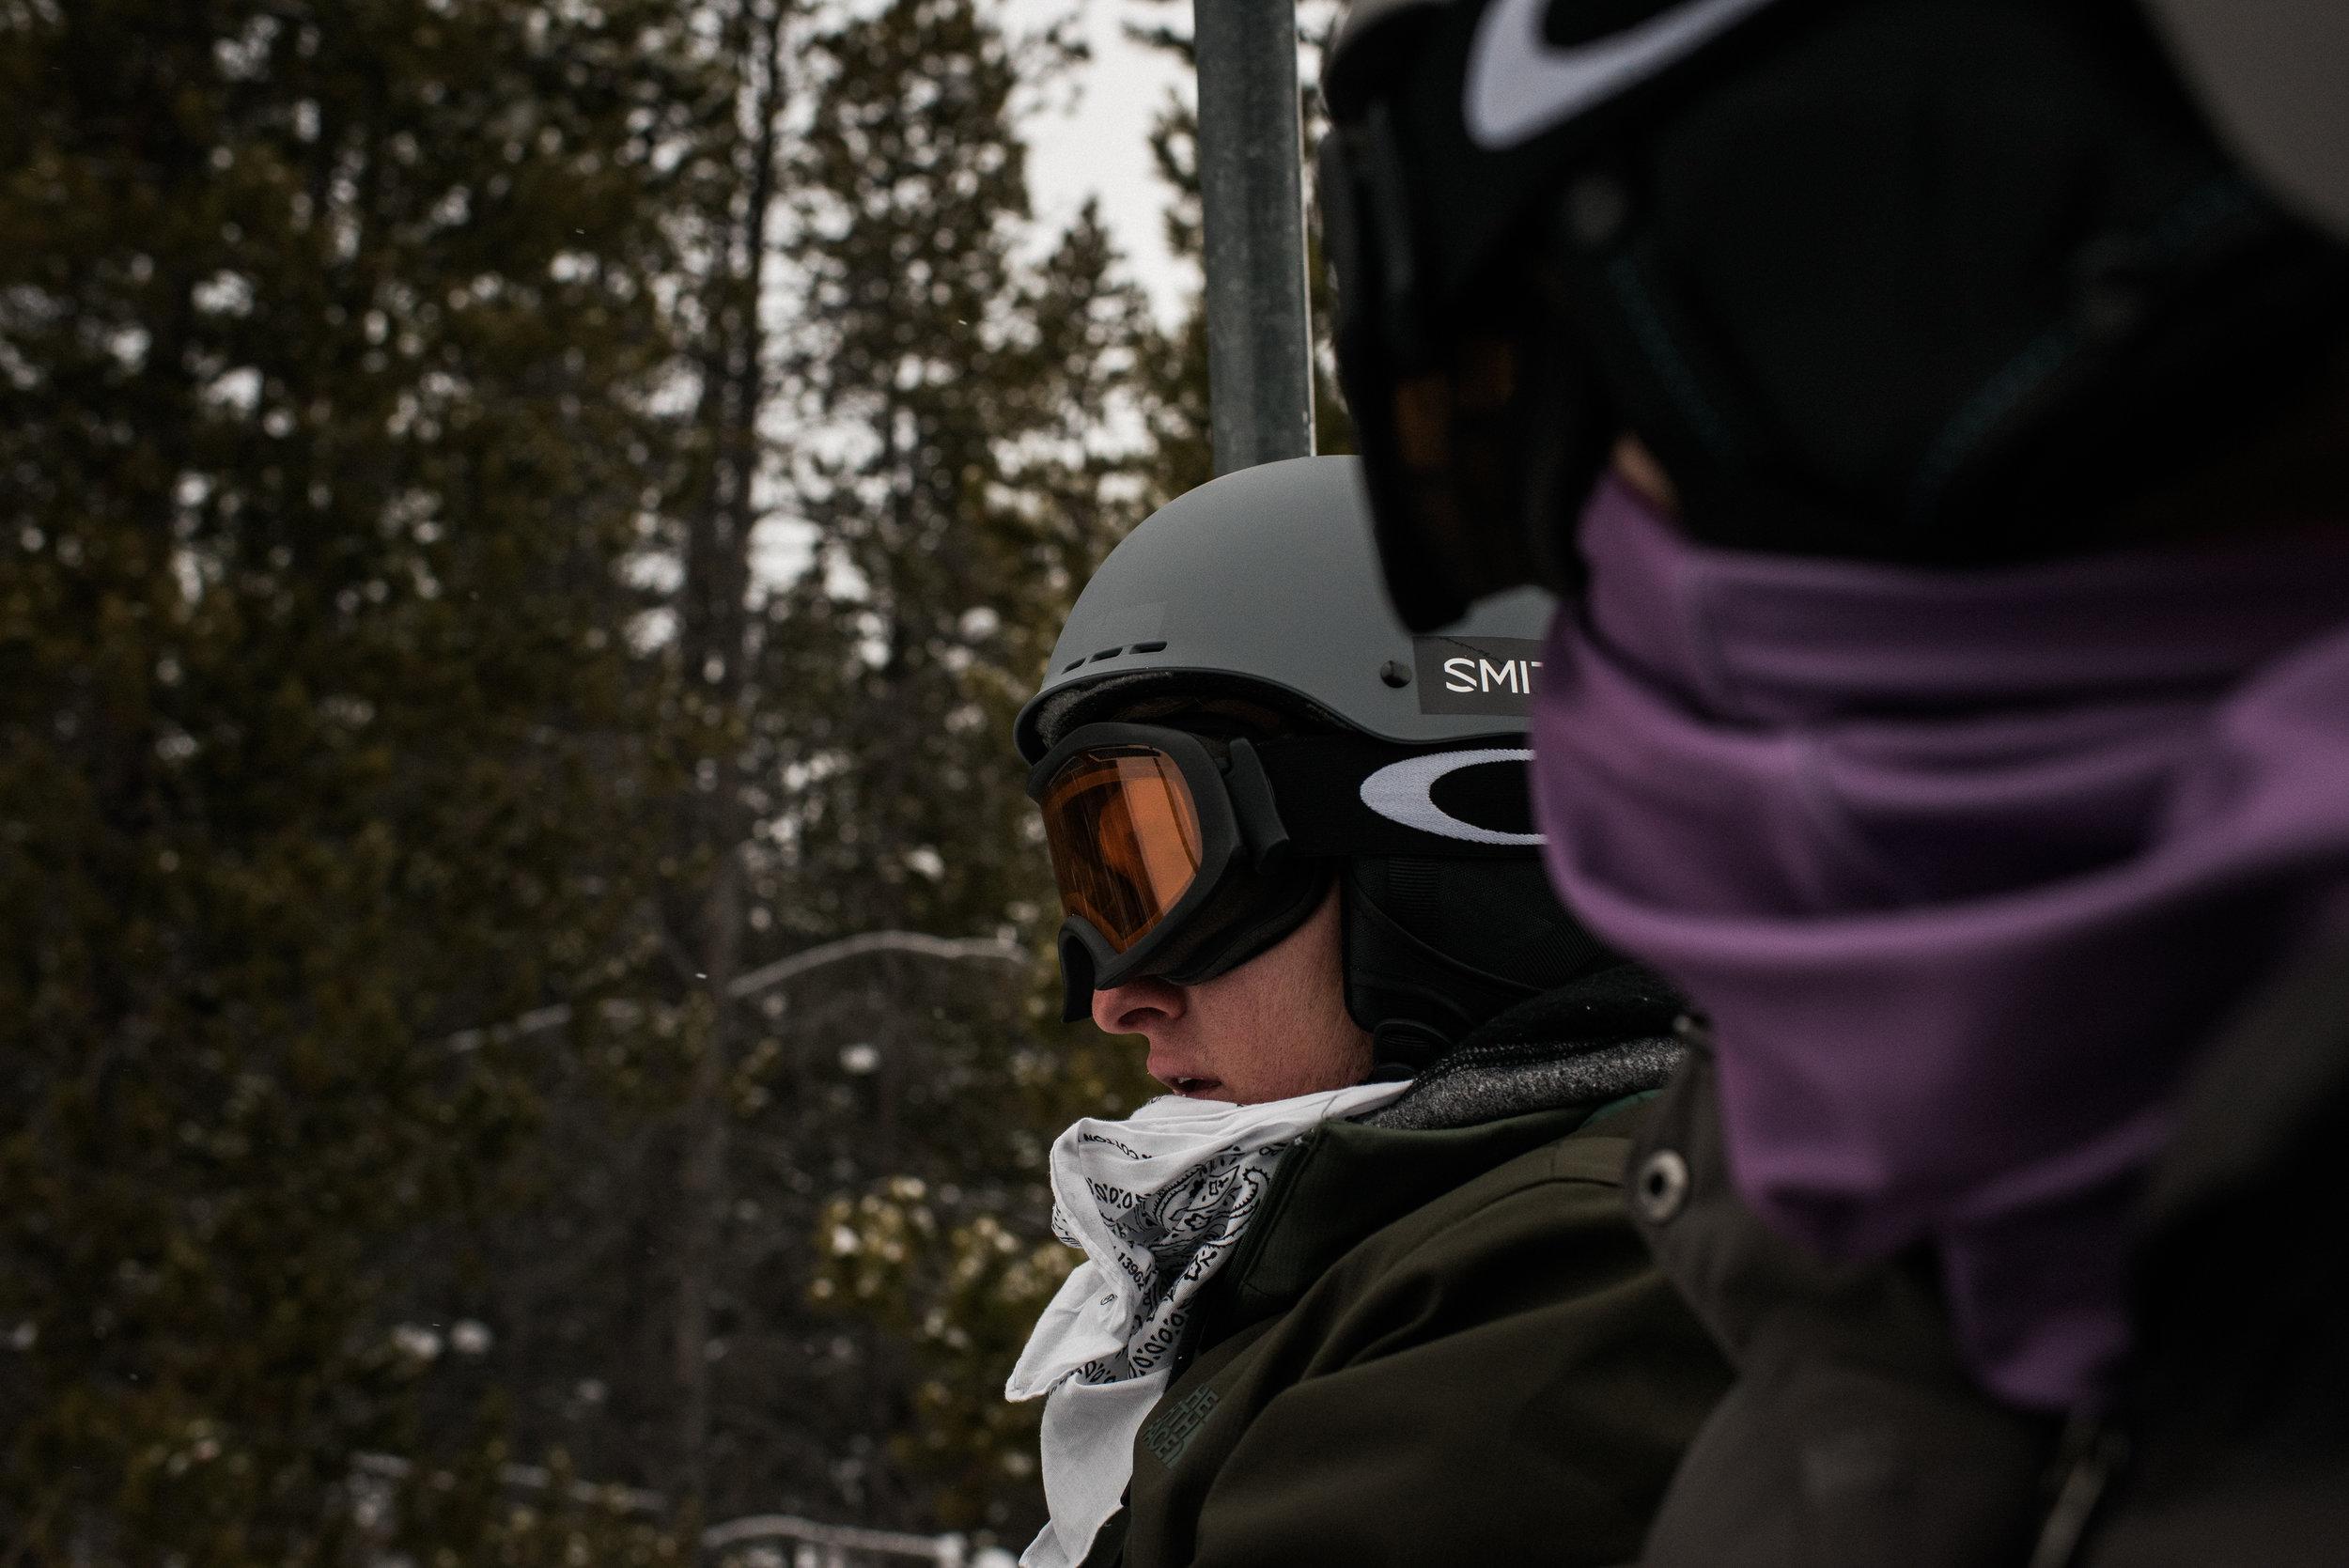 TaraShupe_Outdoor_Photographer_Loweprobags_Colorado_Copper_Mountains_Ski_18.jpg